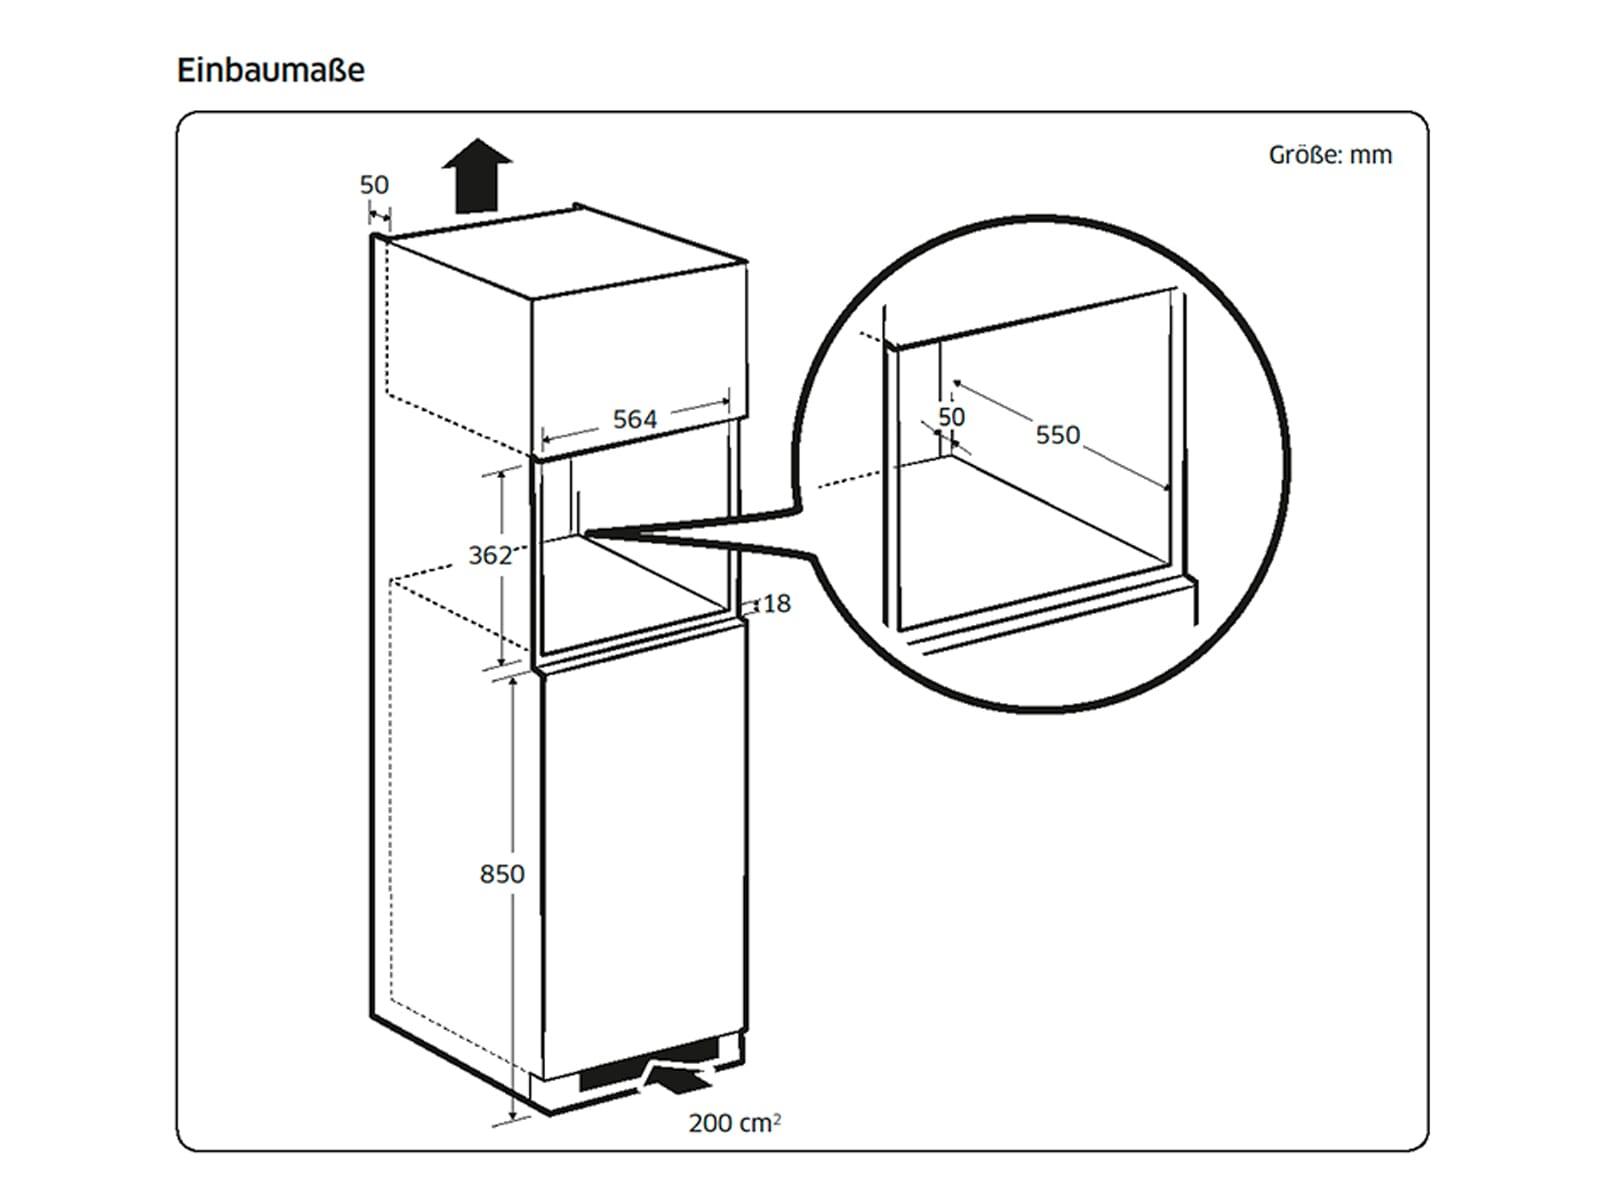 Samsung MG22M8074AT/EG Einbau-Mikrowelle mit Grill Edelstahl